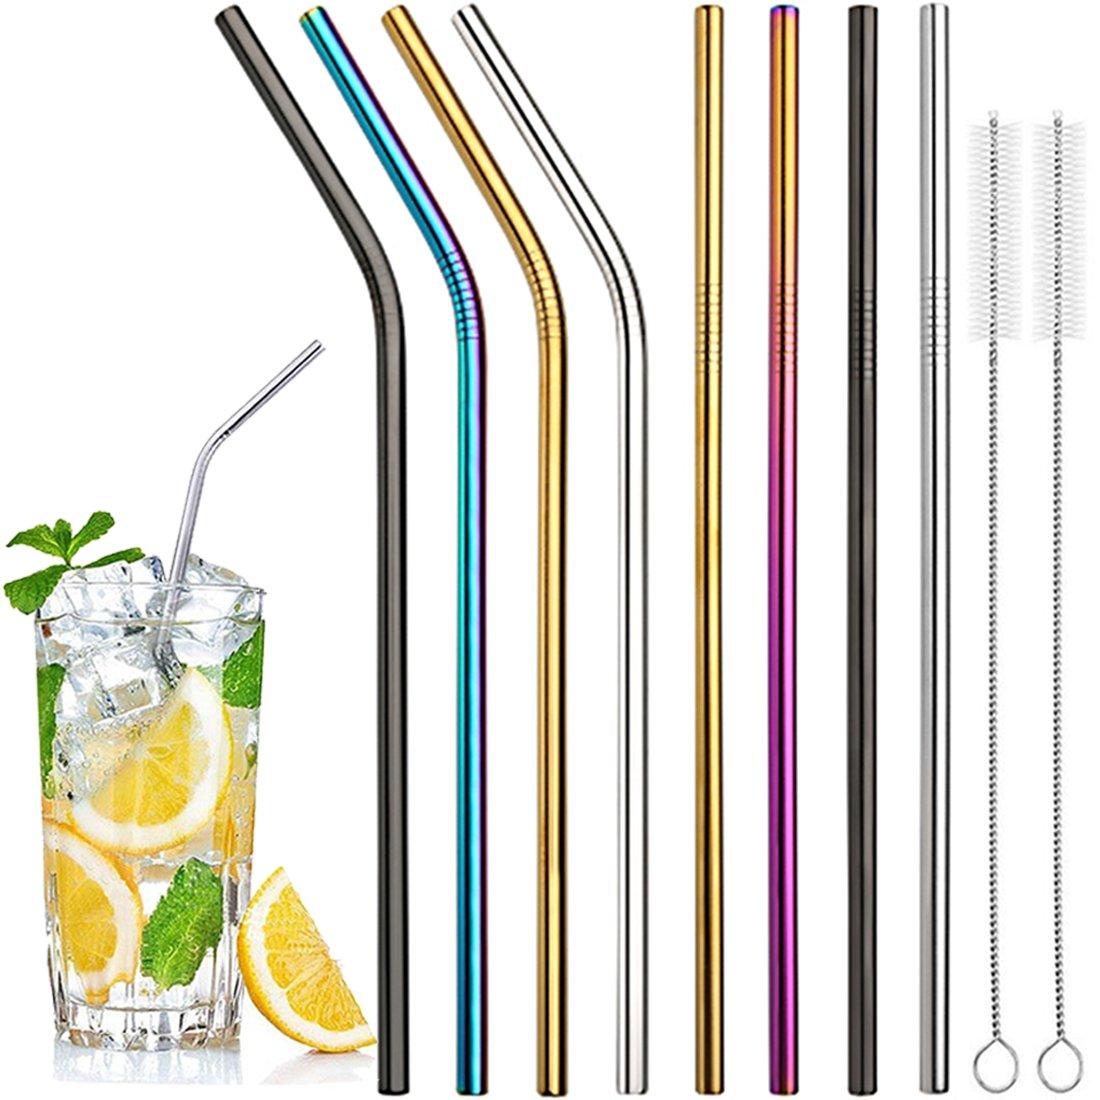 3e759cd69ab Stainless Steel Drinking Straws, Reusable Metal Straws 10.5 inch Long  Colorful for 20 30 OZ Yeti Tumbler, RTIC, Tervis, Ozark Trail, Starbucks,  Mason ...